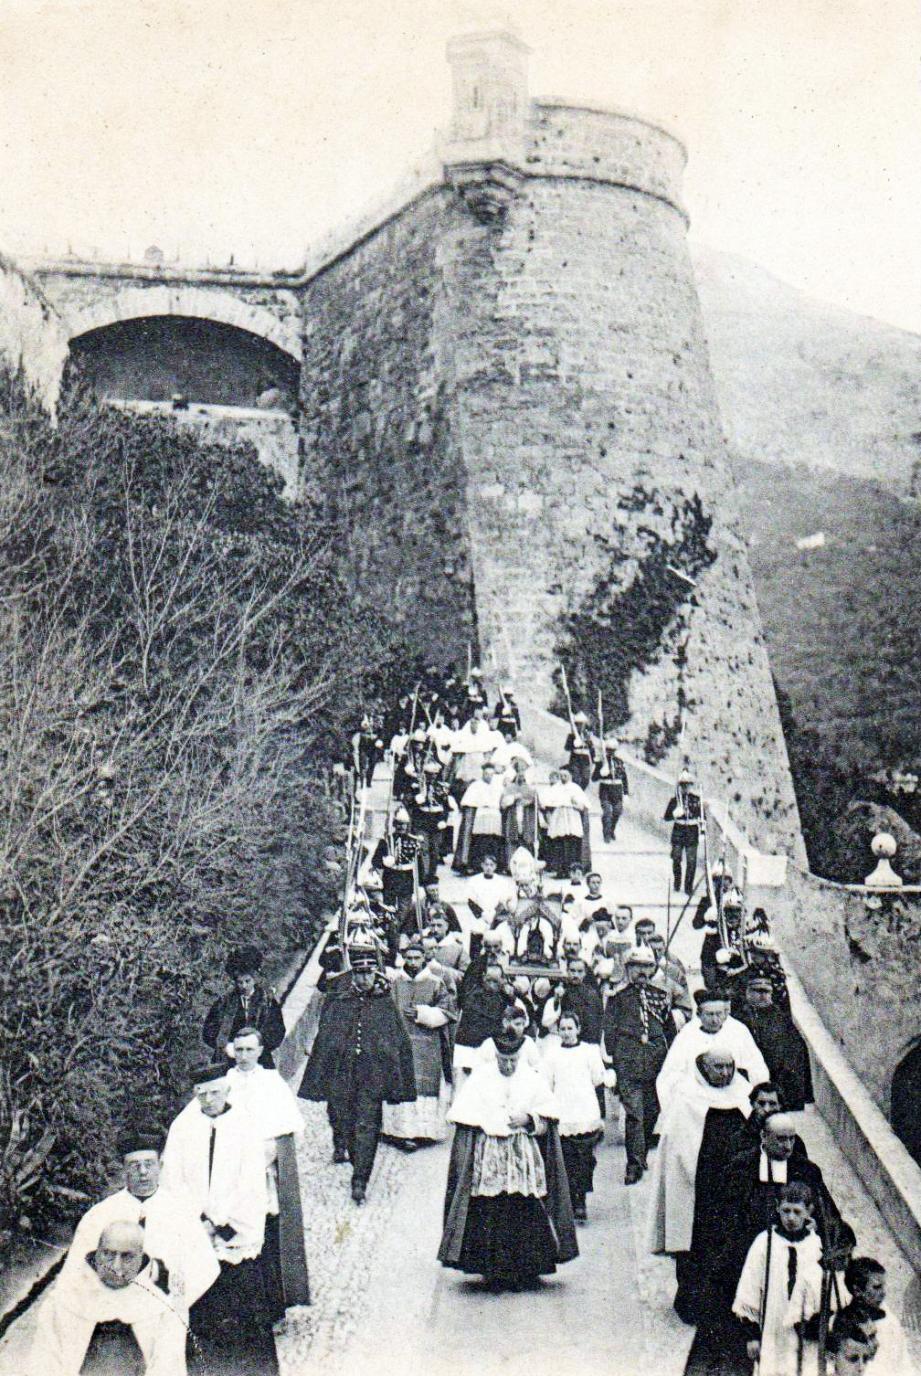 Les carabiniers dans la Rampe Major escortant la procession de Sainte-Dévote.(DR)